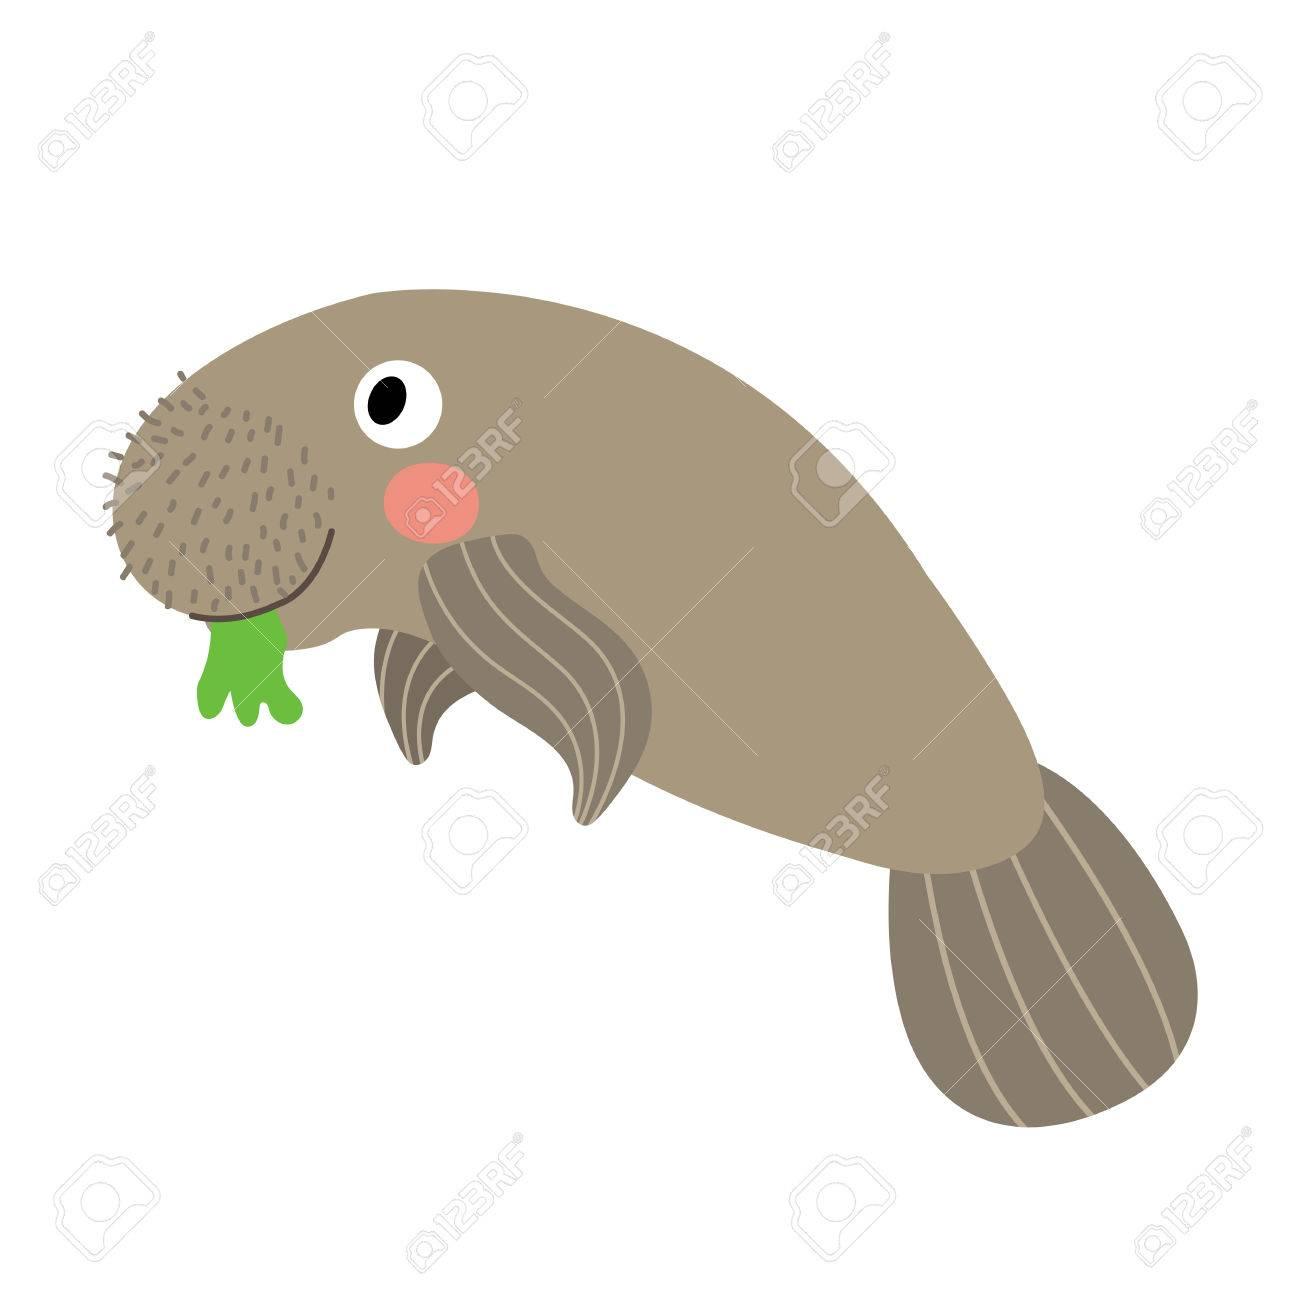 hight resolution of manatee animal cartoon character isolated on white background illustration stock vector 65375061